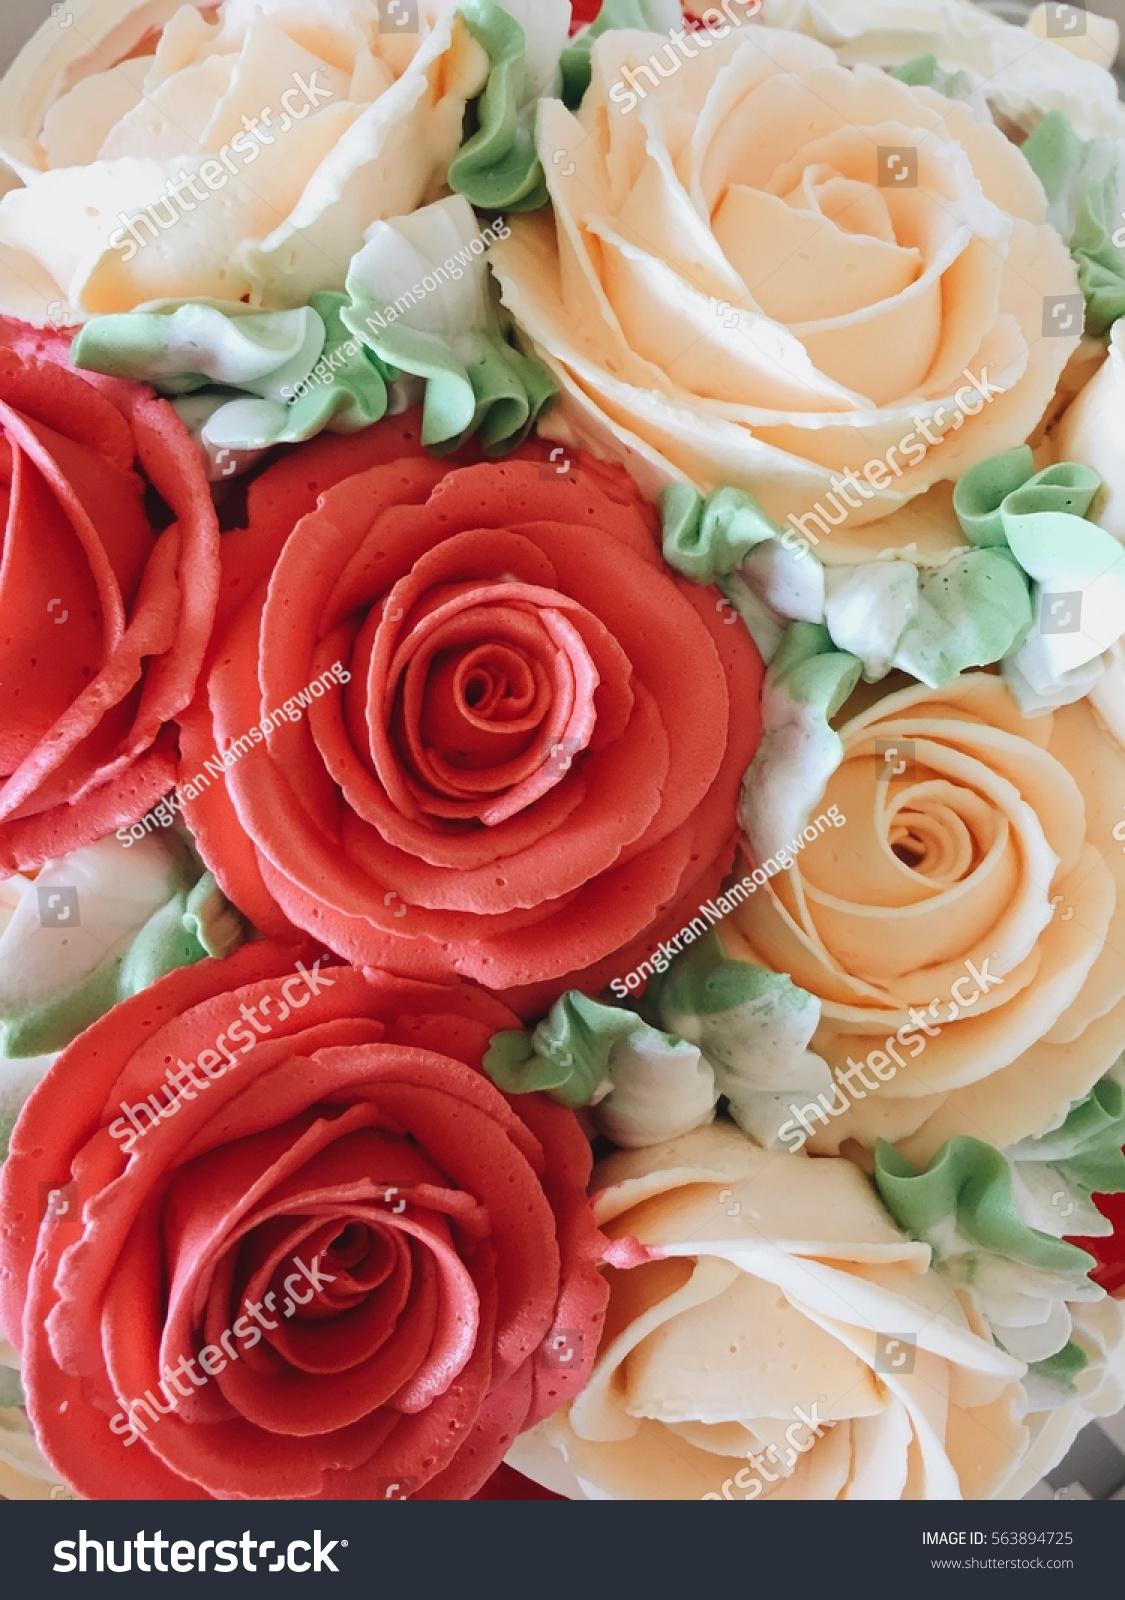 Rose Birthday Cake Stock Photo Edit Now 563894725 Shutterstock